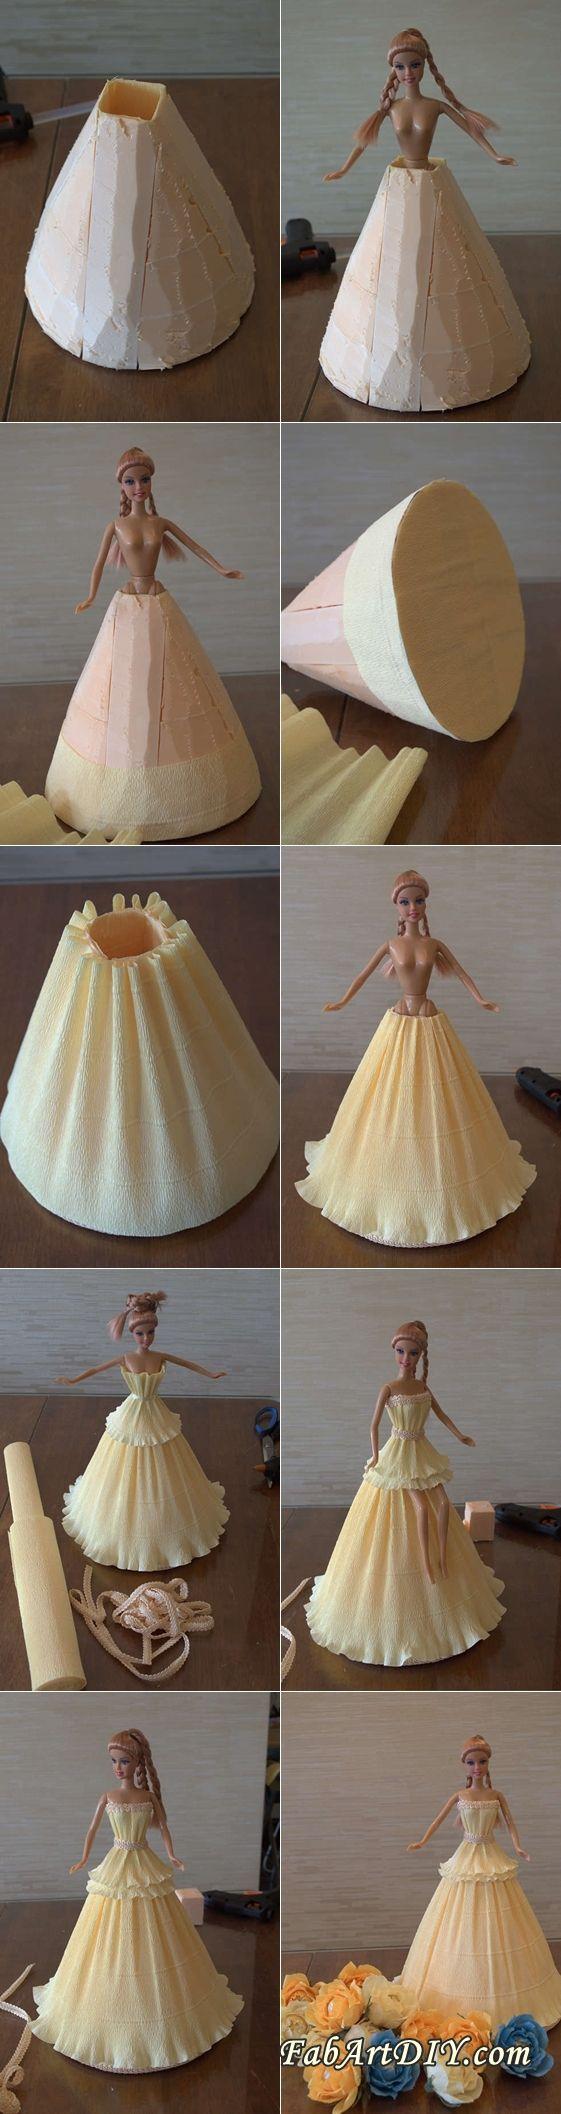 3...... DIY Crepe Paper Barbie Dress | www.FabArtDIY.com LIKE Us on Facebook ==> https://www.facebook.com/FabArtDIY